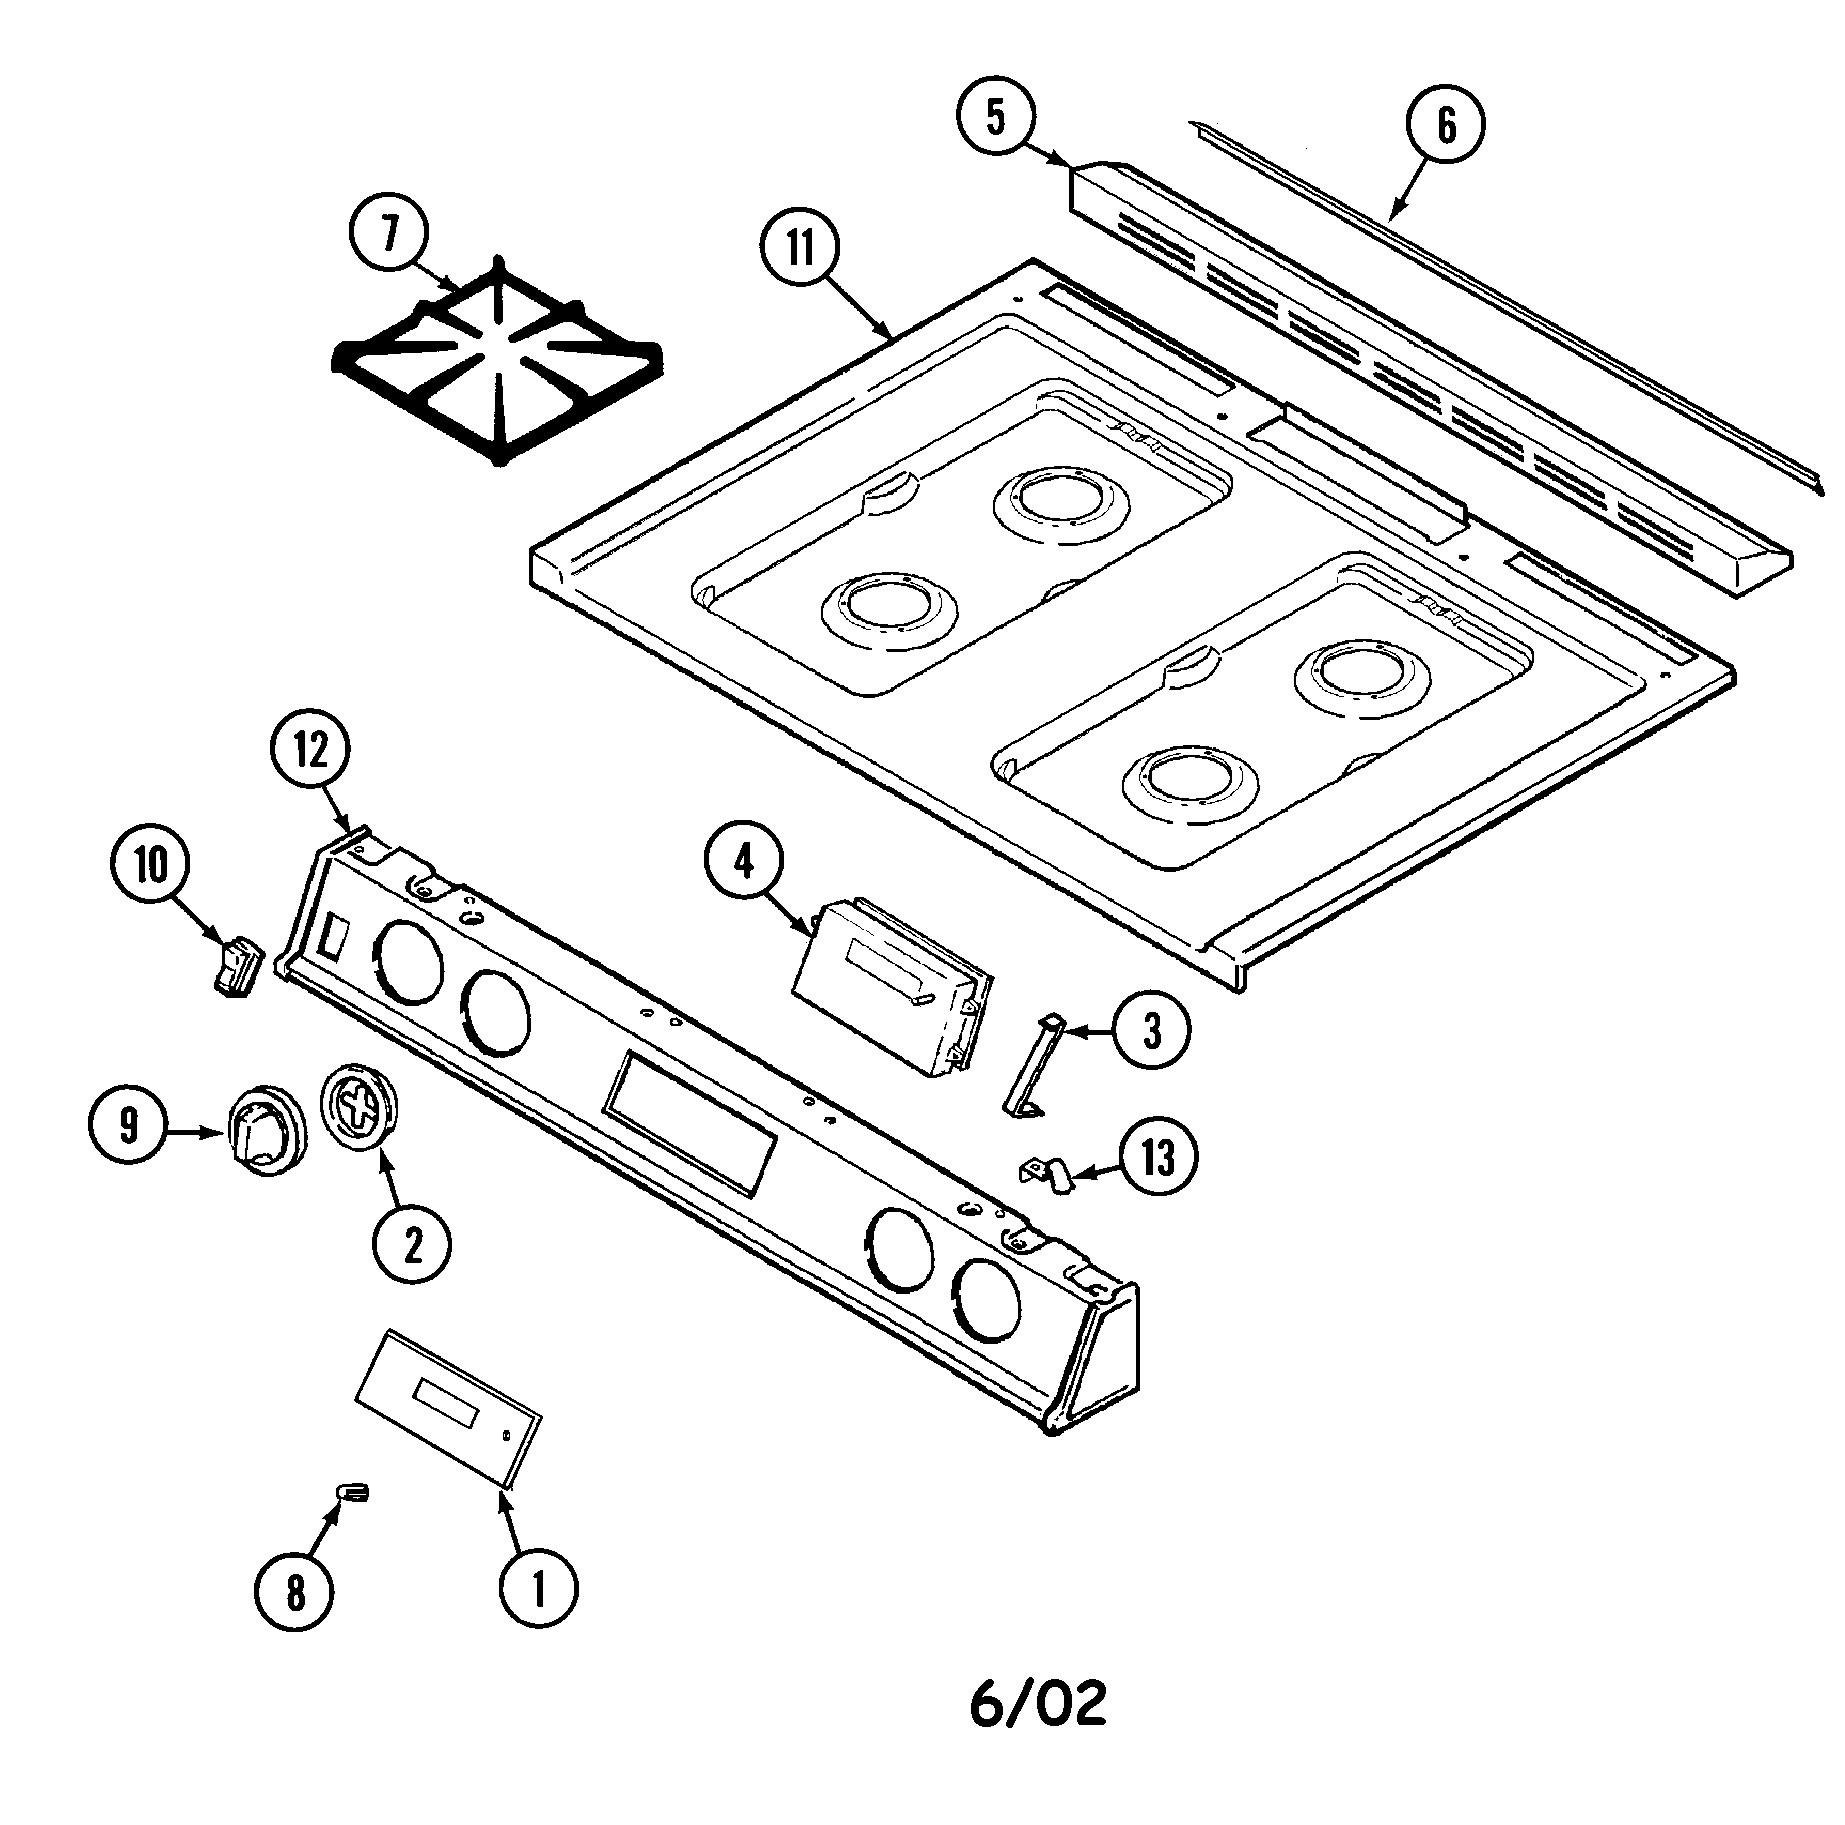 Dodge Ram Oem Parts Diagram My Wiring Diagram